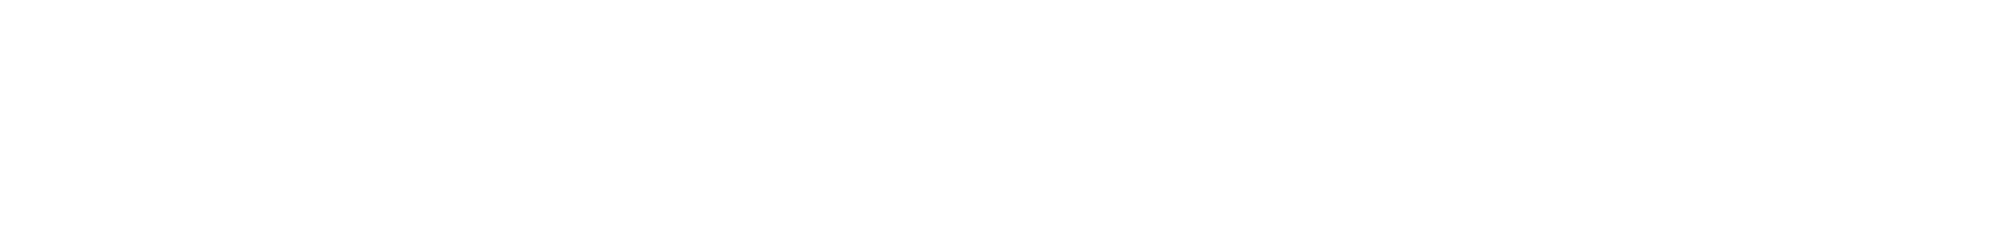 LC_Logo_-ohne-Claim_weiß.png